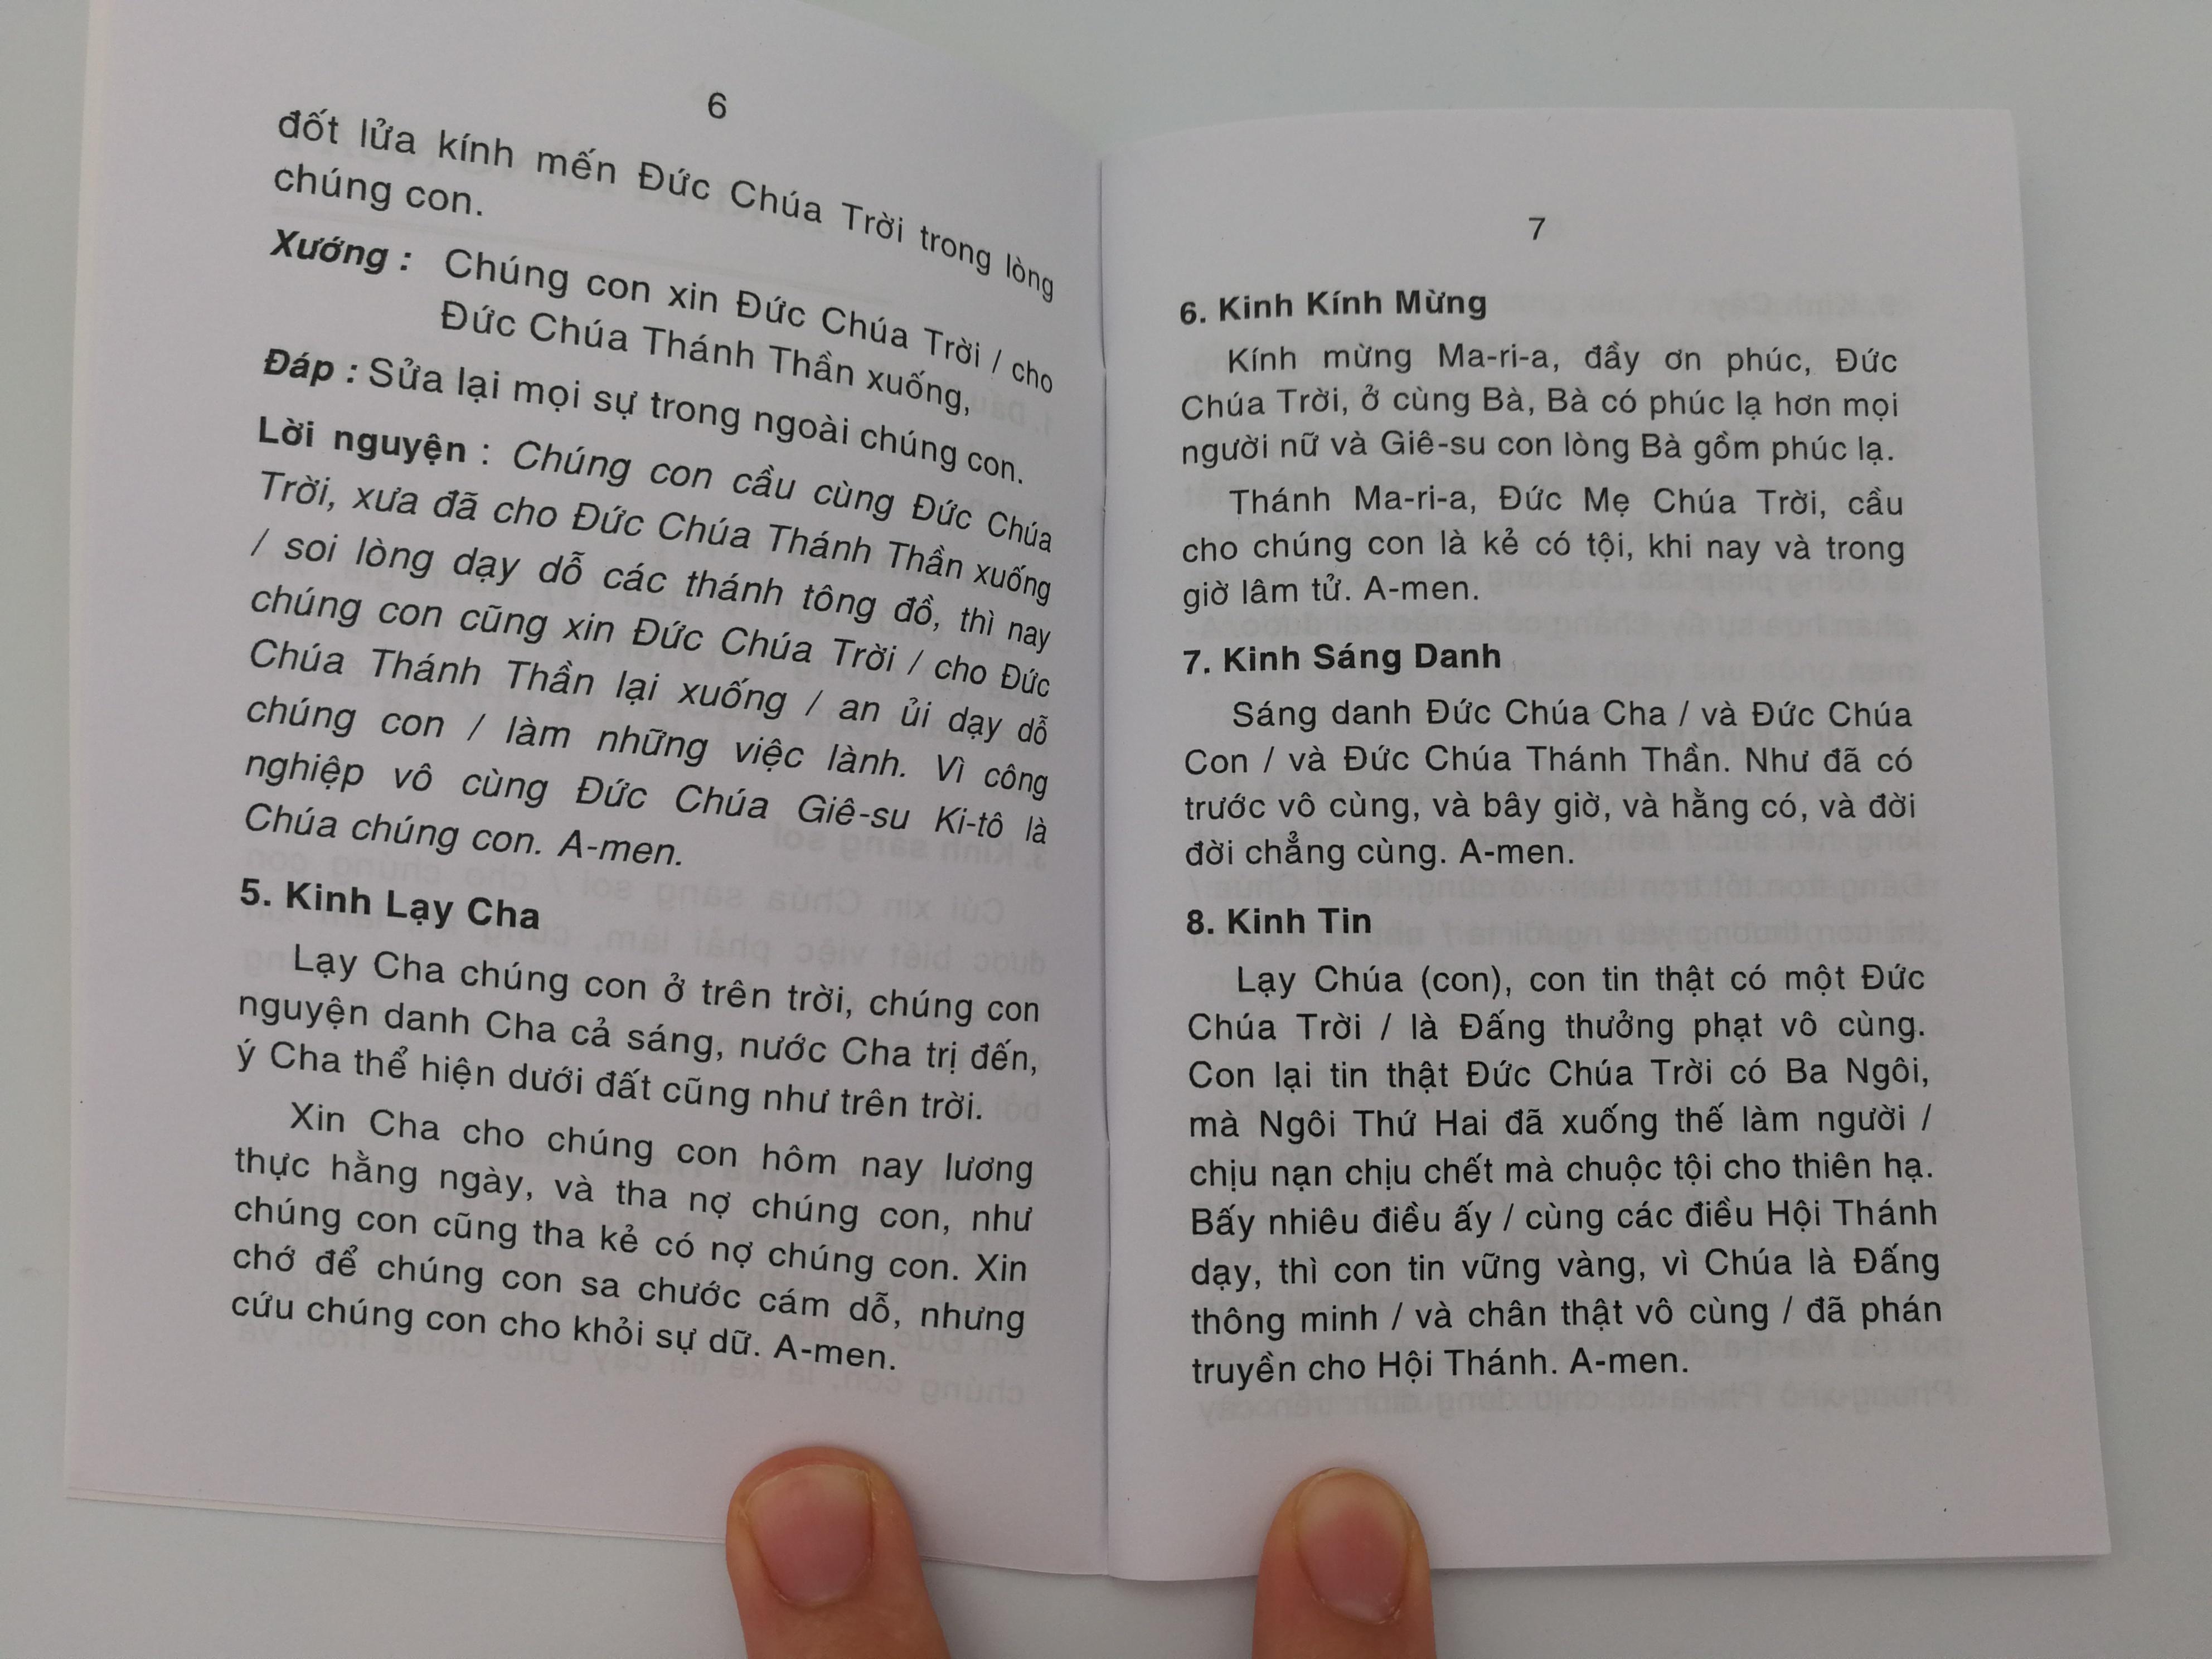 s-ch-kinh-nh-vietnamese-language-prayer-book-4.jpg